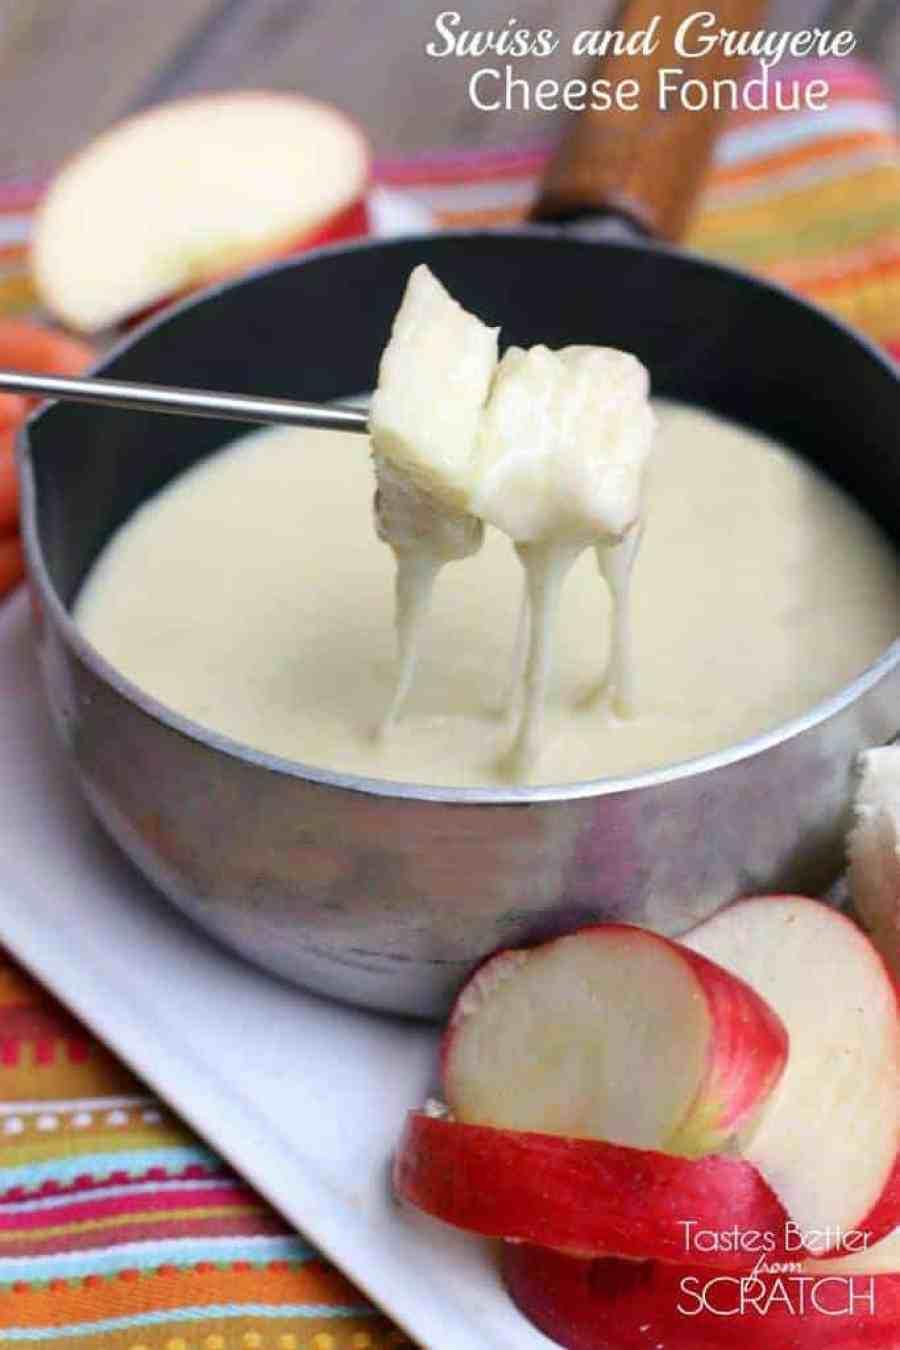 Swiss and Gruyere Cheese Fondue recipe on TastesBetterFromScratch.com